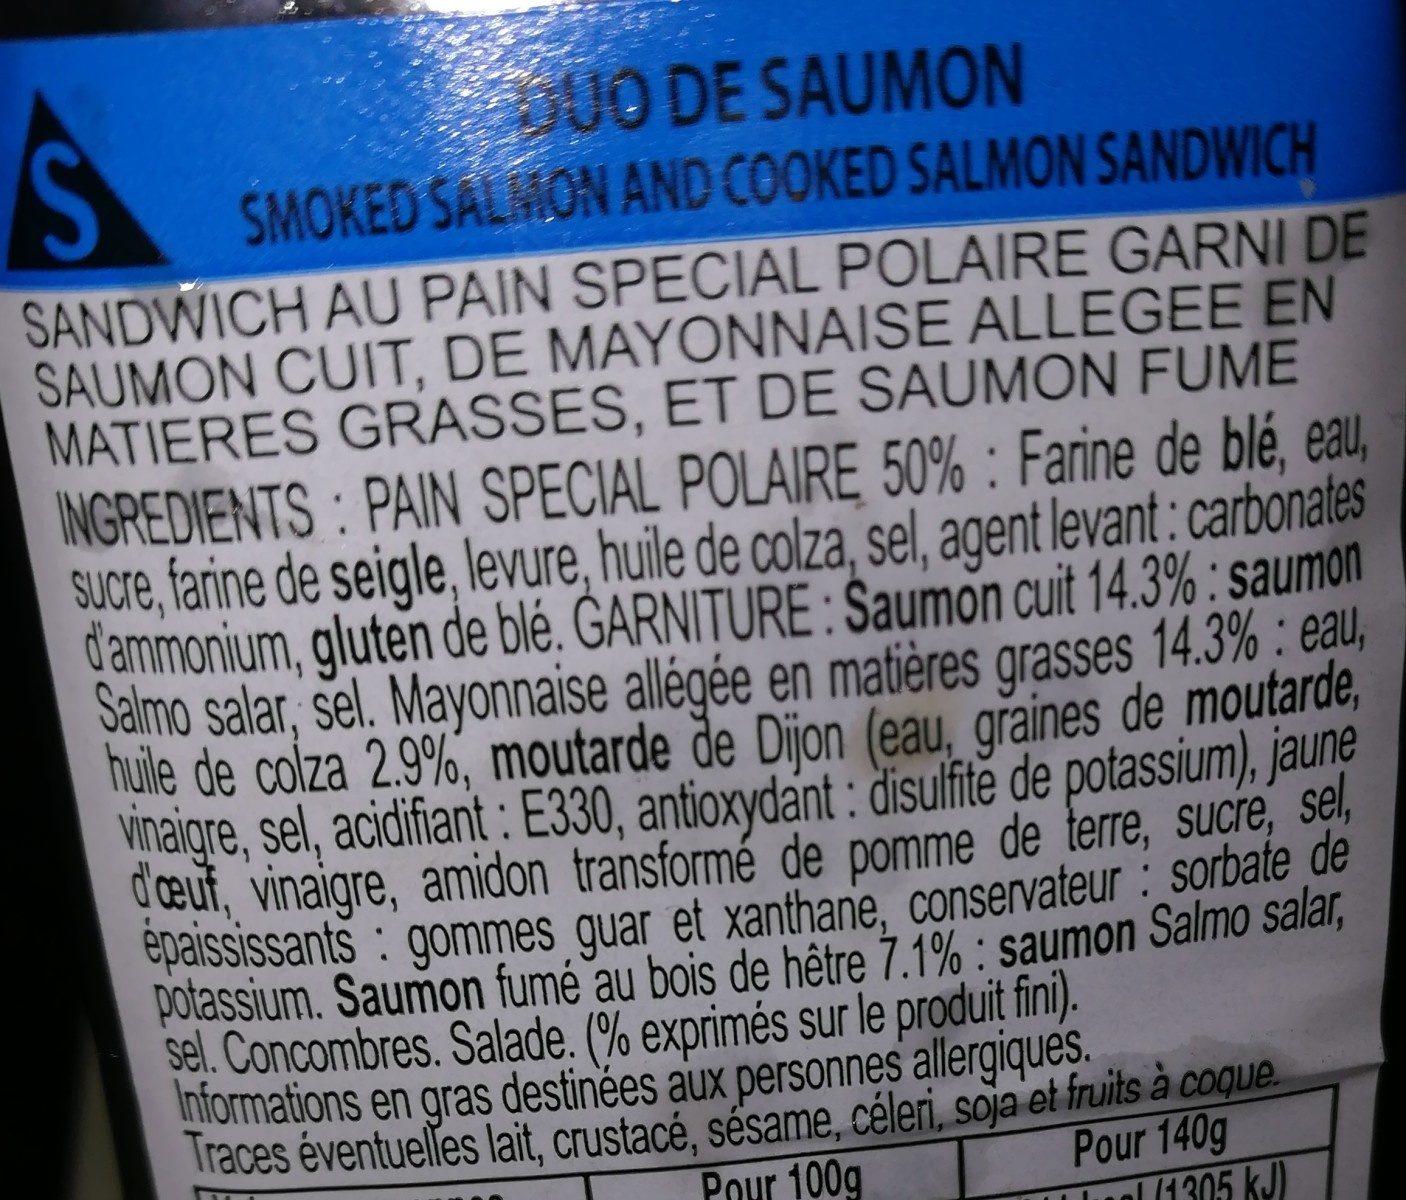 Sandwich Duo de Saumon - Ingredients